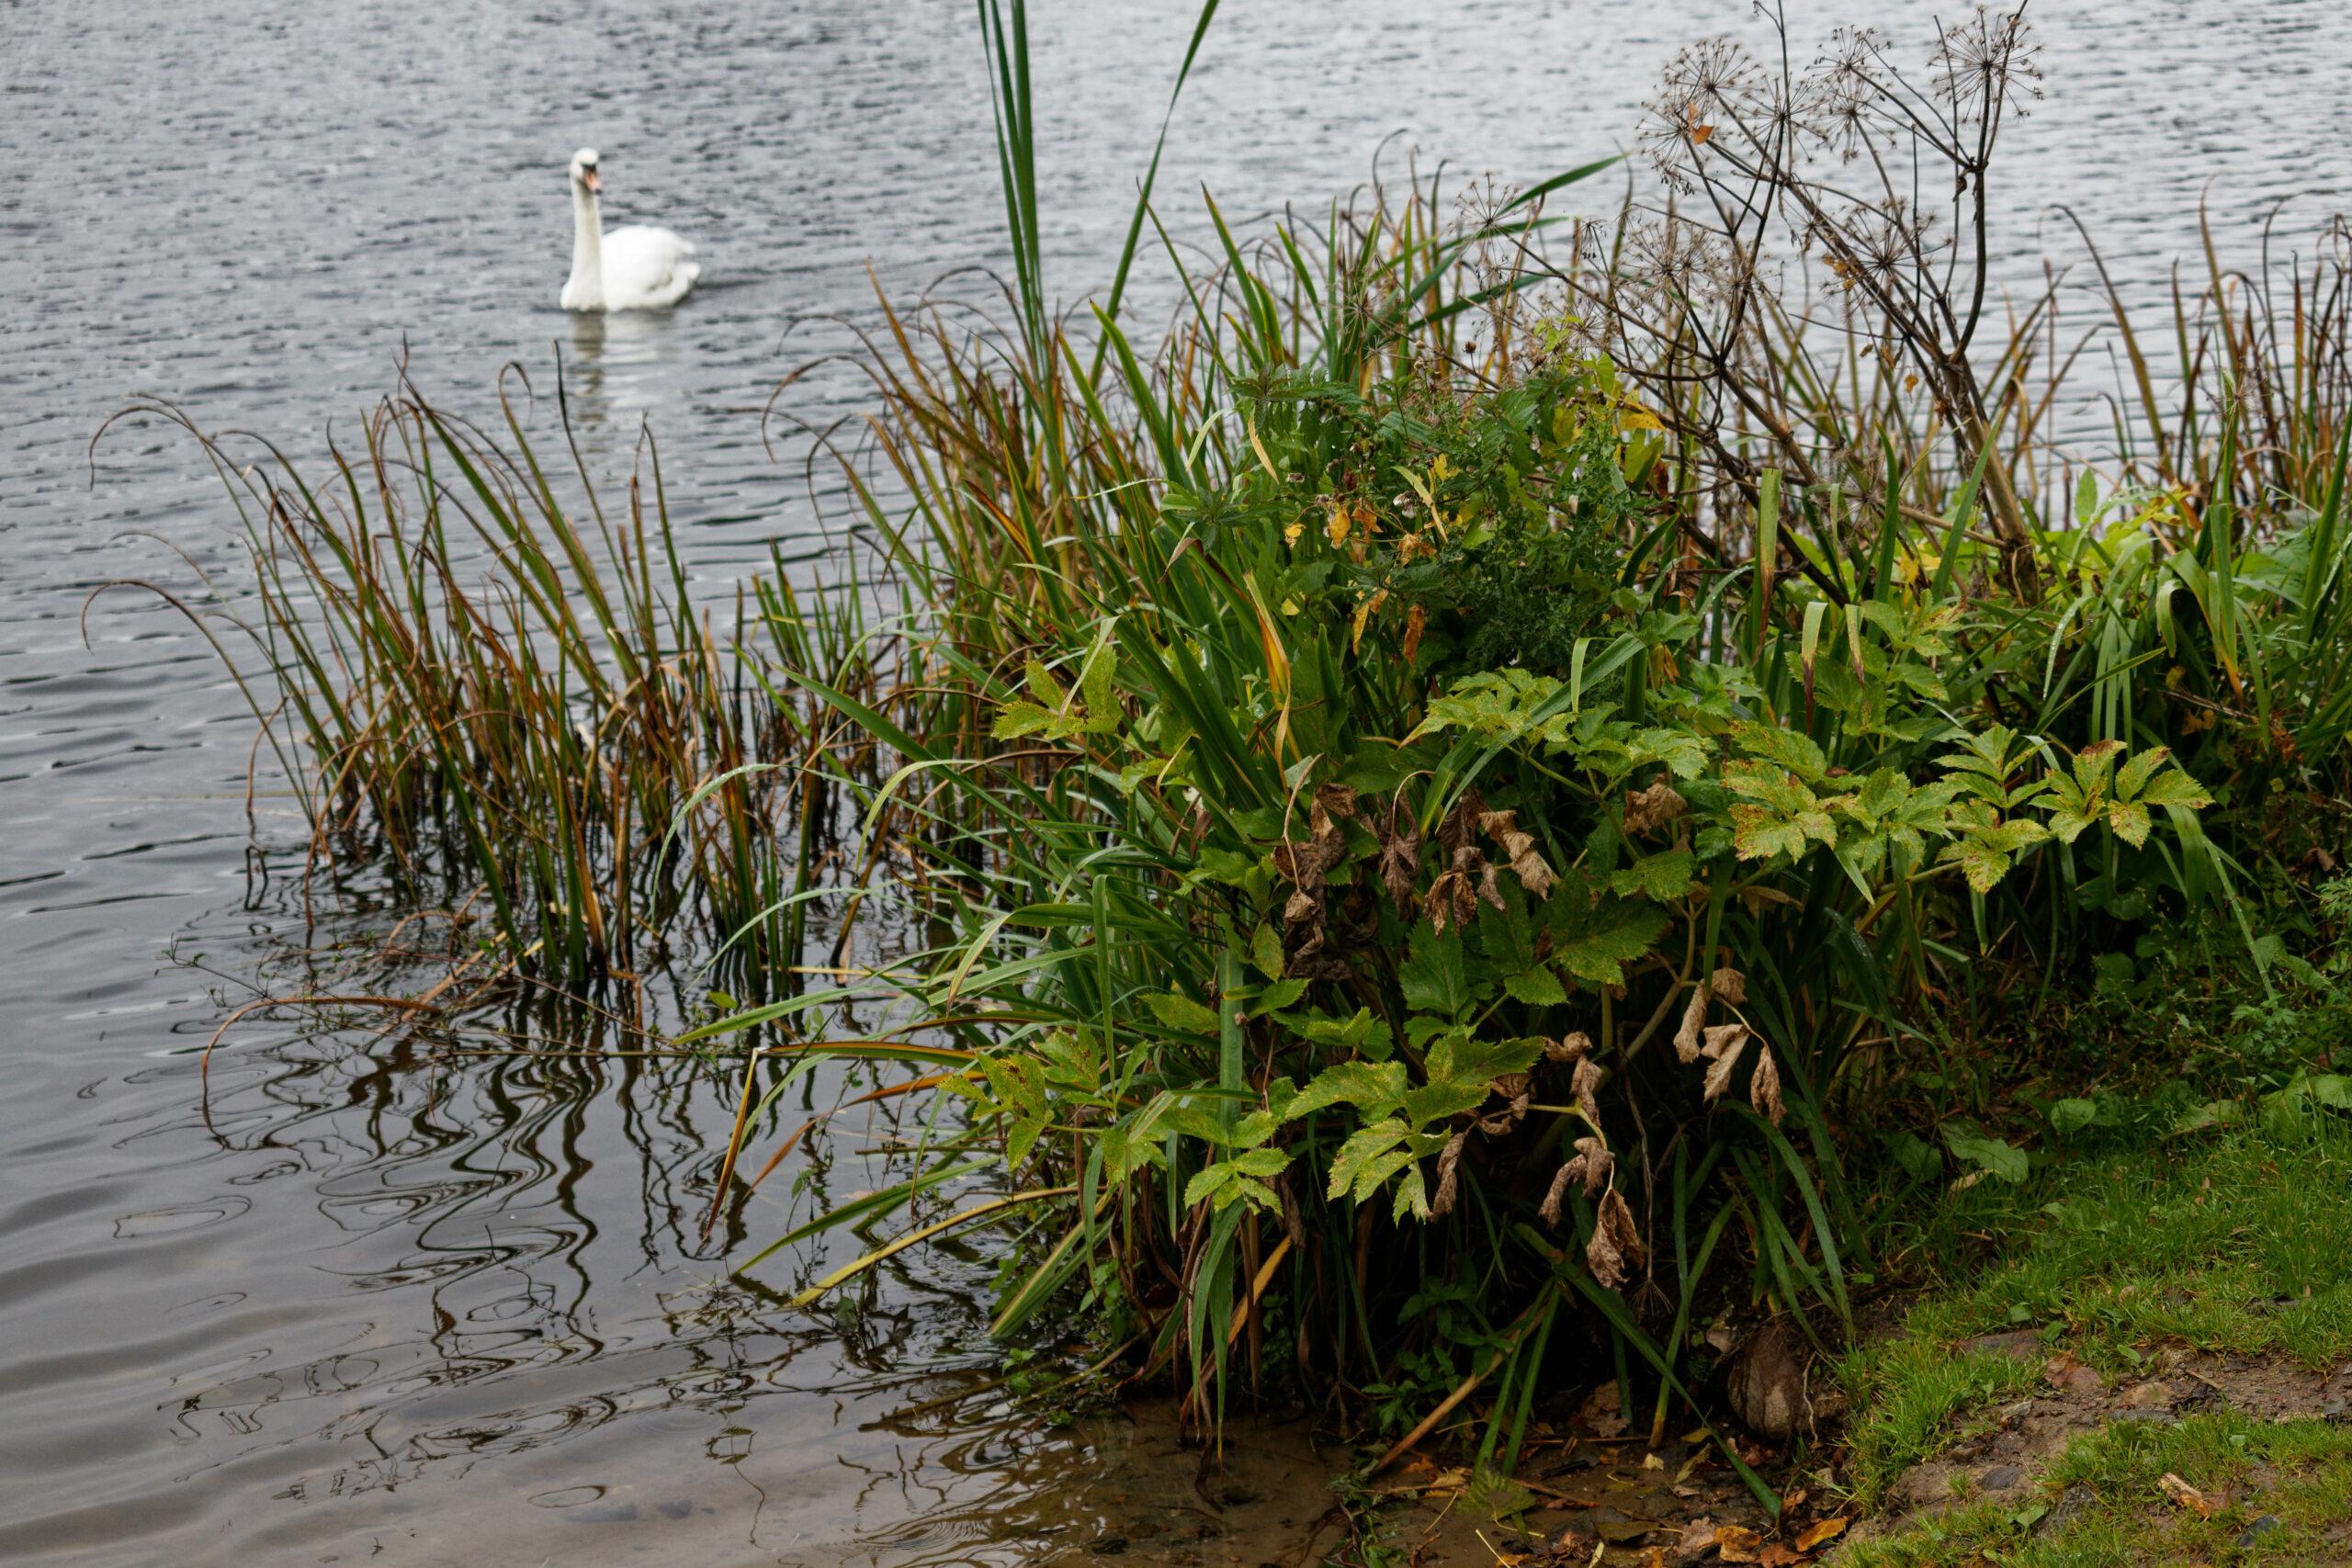 Bodo Jarren - Stadtpark 05.10.2021 - Kommt ein Schwan geschwommen